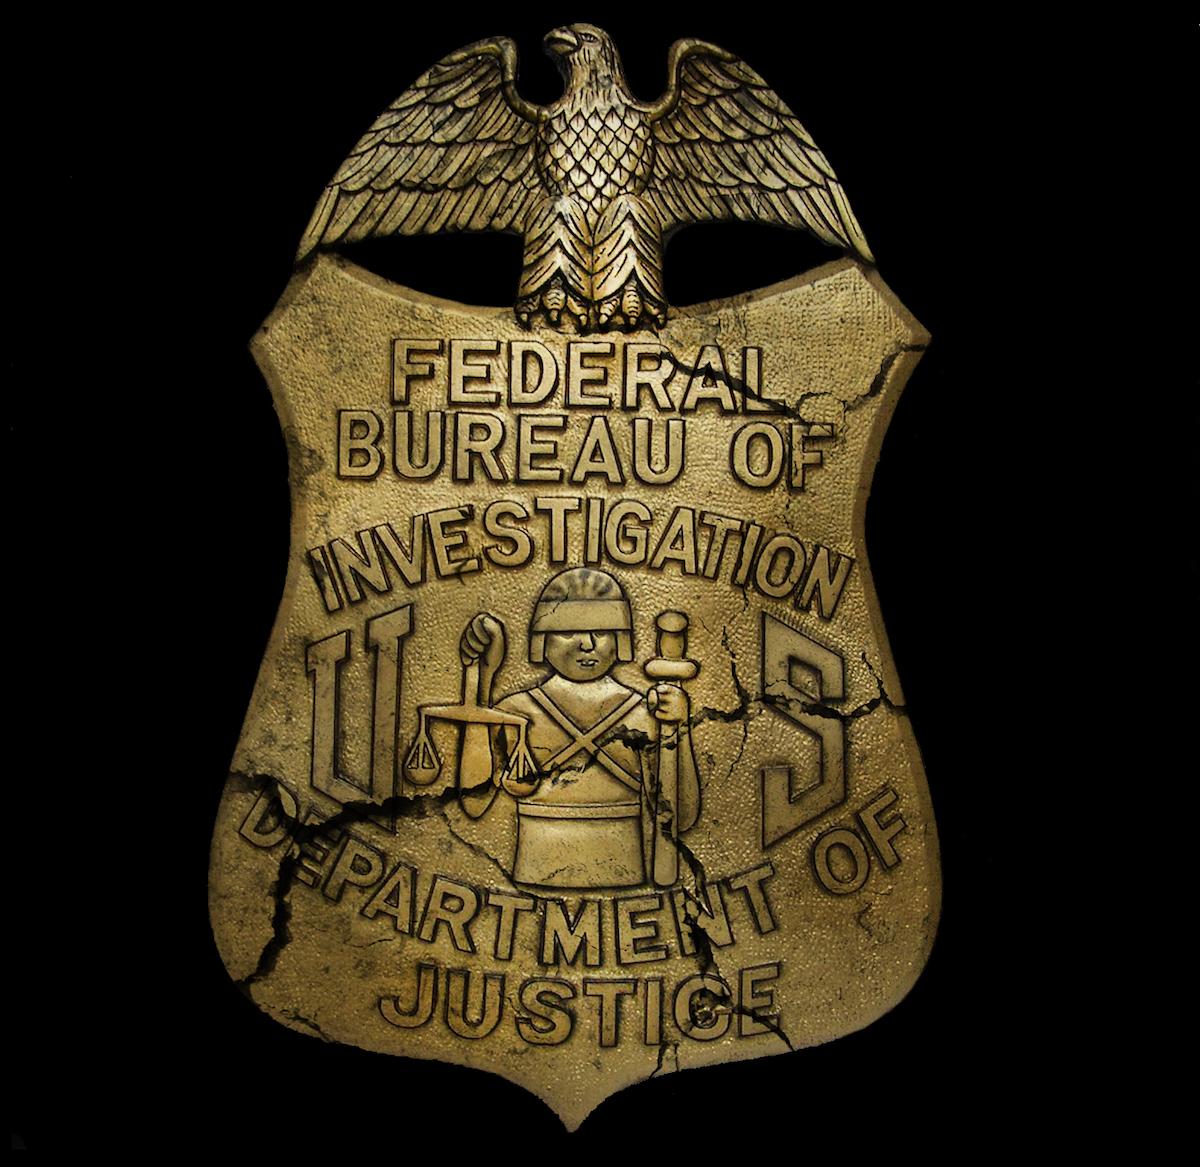 The FBI Scandal